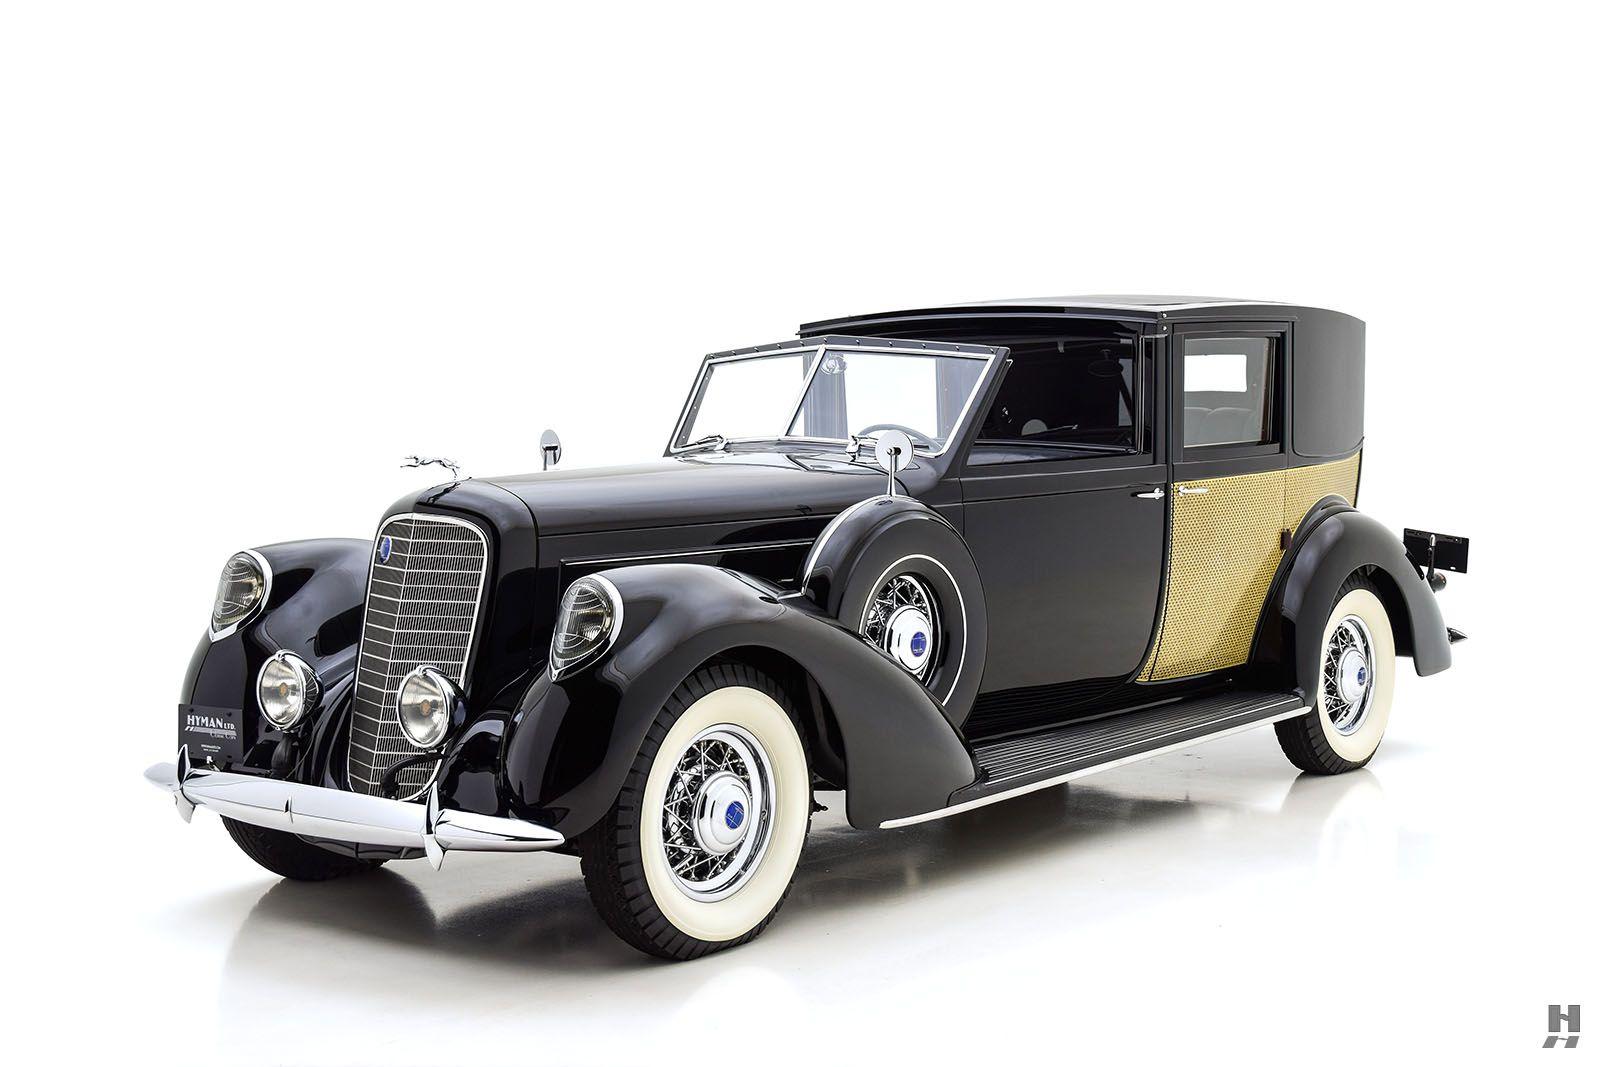 1937 LINCOLN MODEL K PANEL BROUGHAM | antique cars HYMAN LTO ...